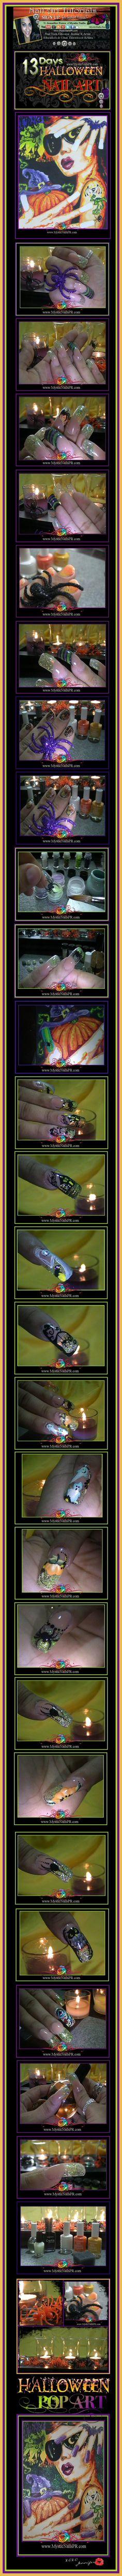 13 Days of HALLOWEEN  Nail Art Designs by Jennifer Perez of Mystic Nails